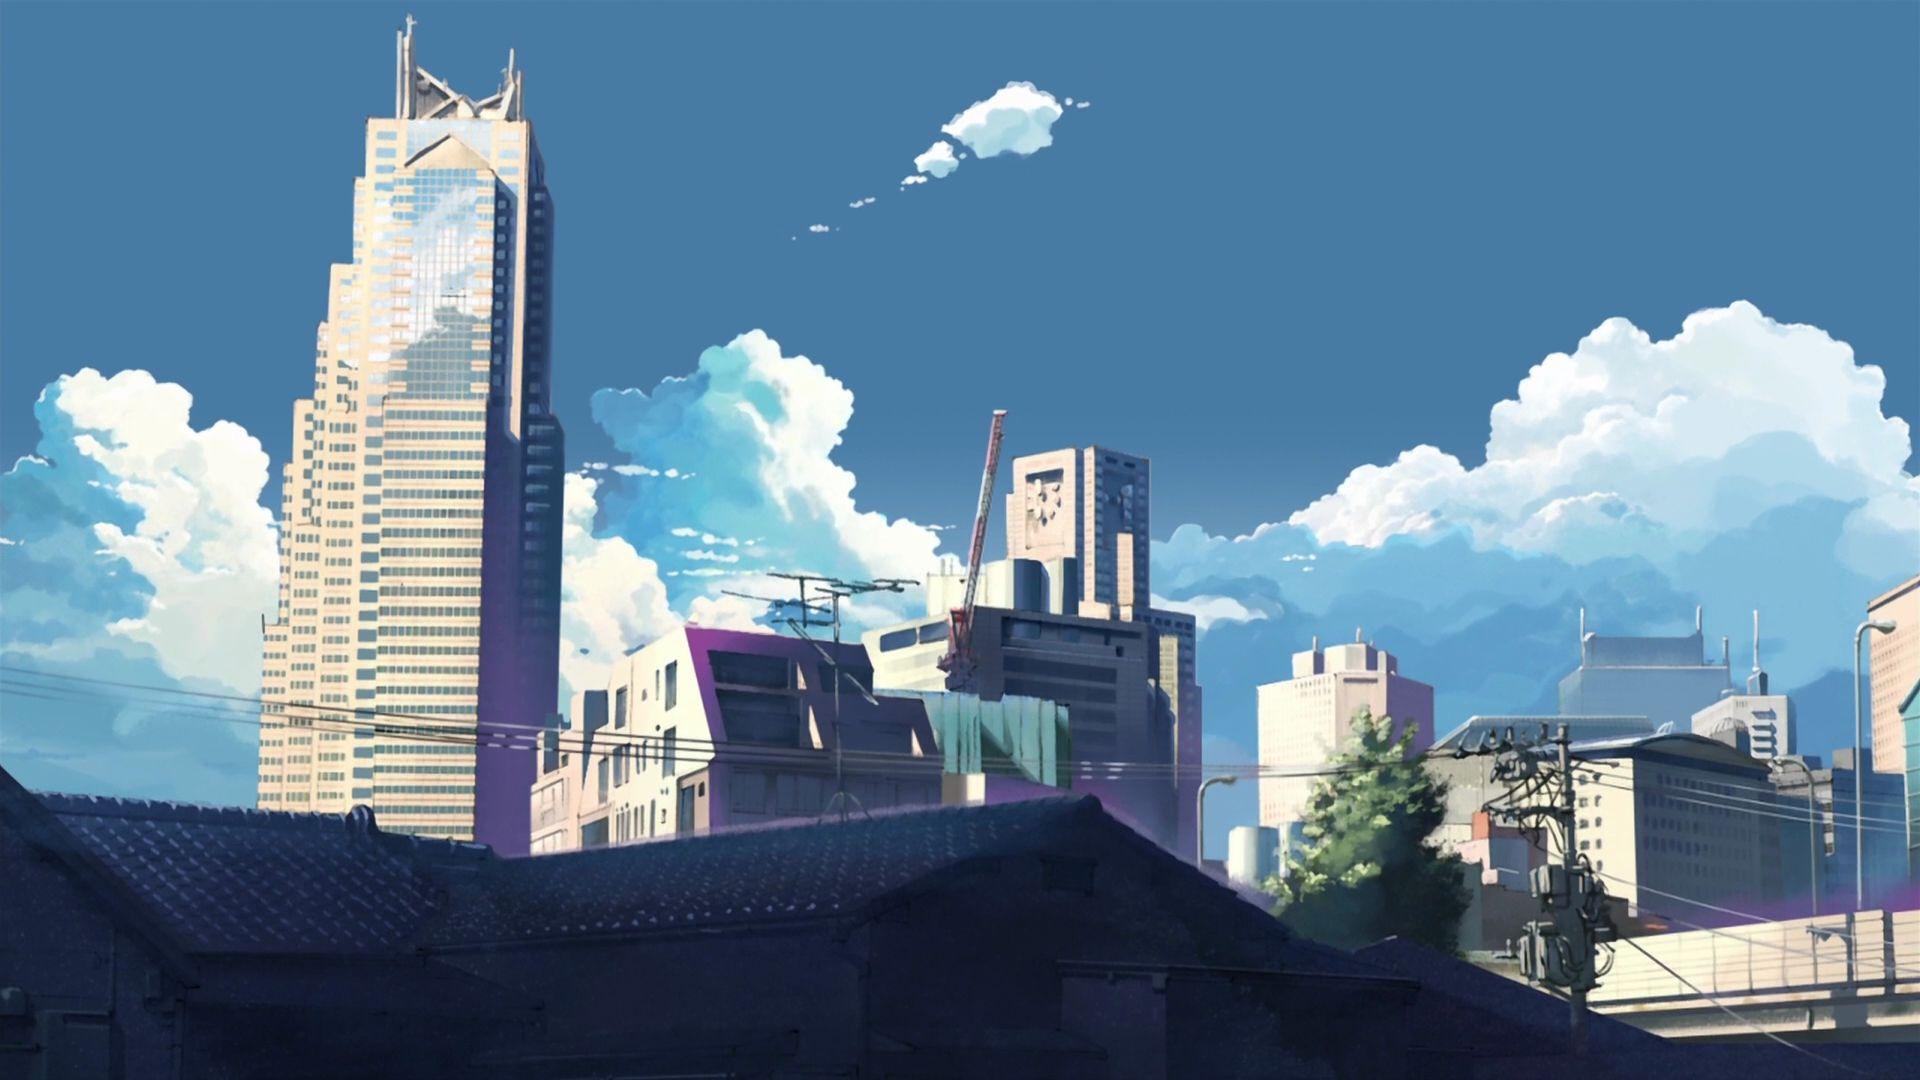 6 hours ago wallpapercave.com more. Anime Aesthetic Retro Desktop Wallpapers - Wallpaper Cave